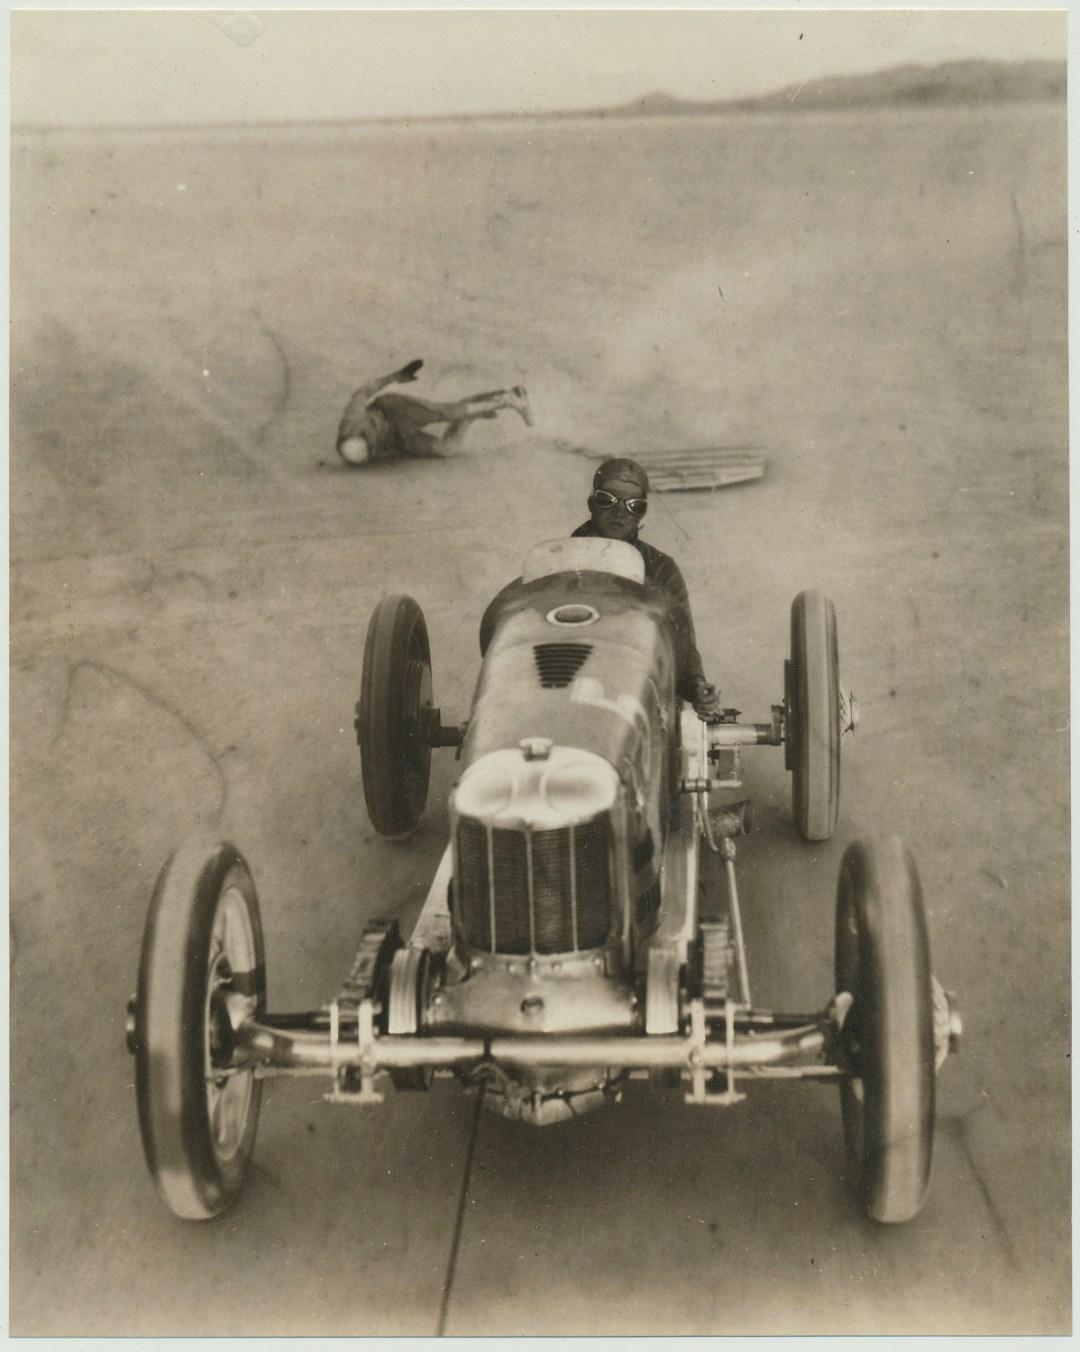 Surfboarding Behind Speedy Race Car :: 1930